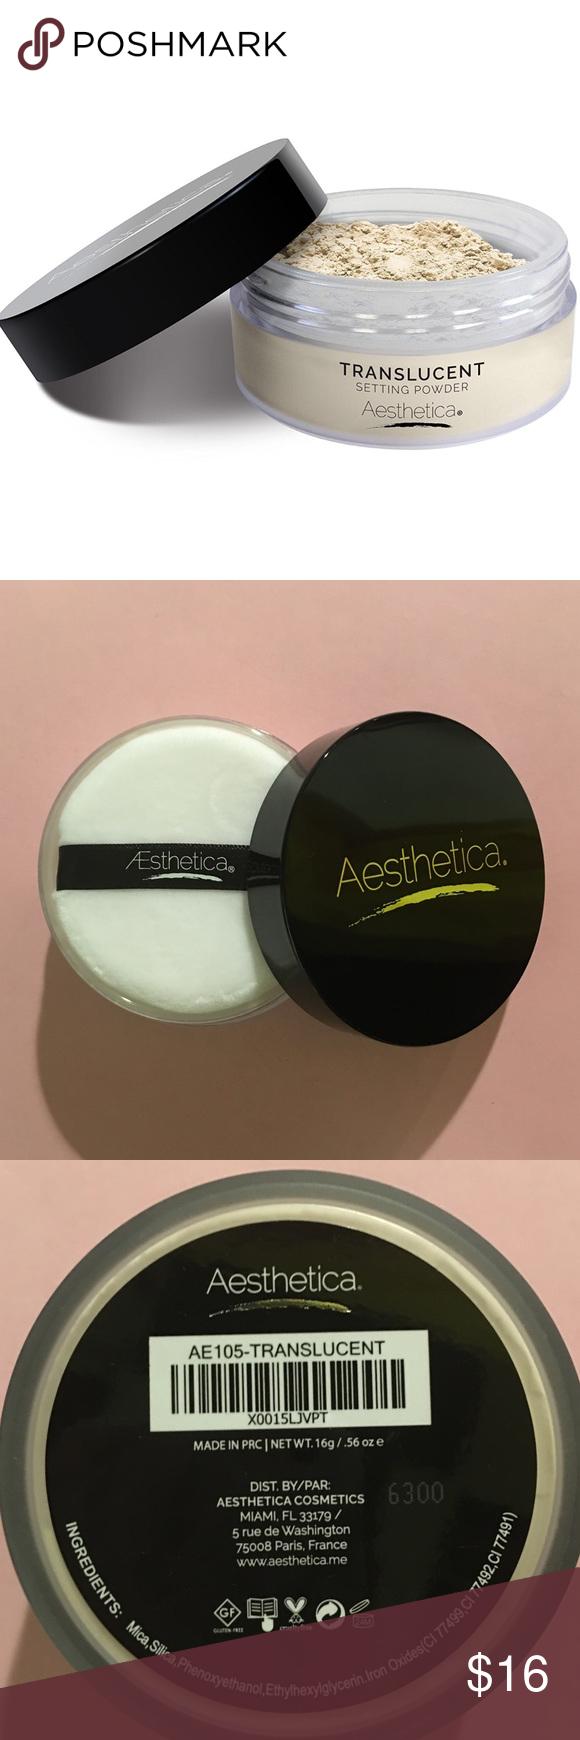 new talcfree luxury setting powder nwt Setting powder